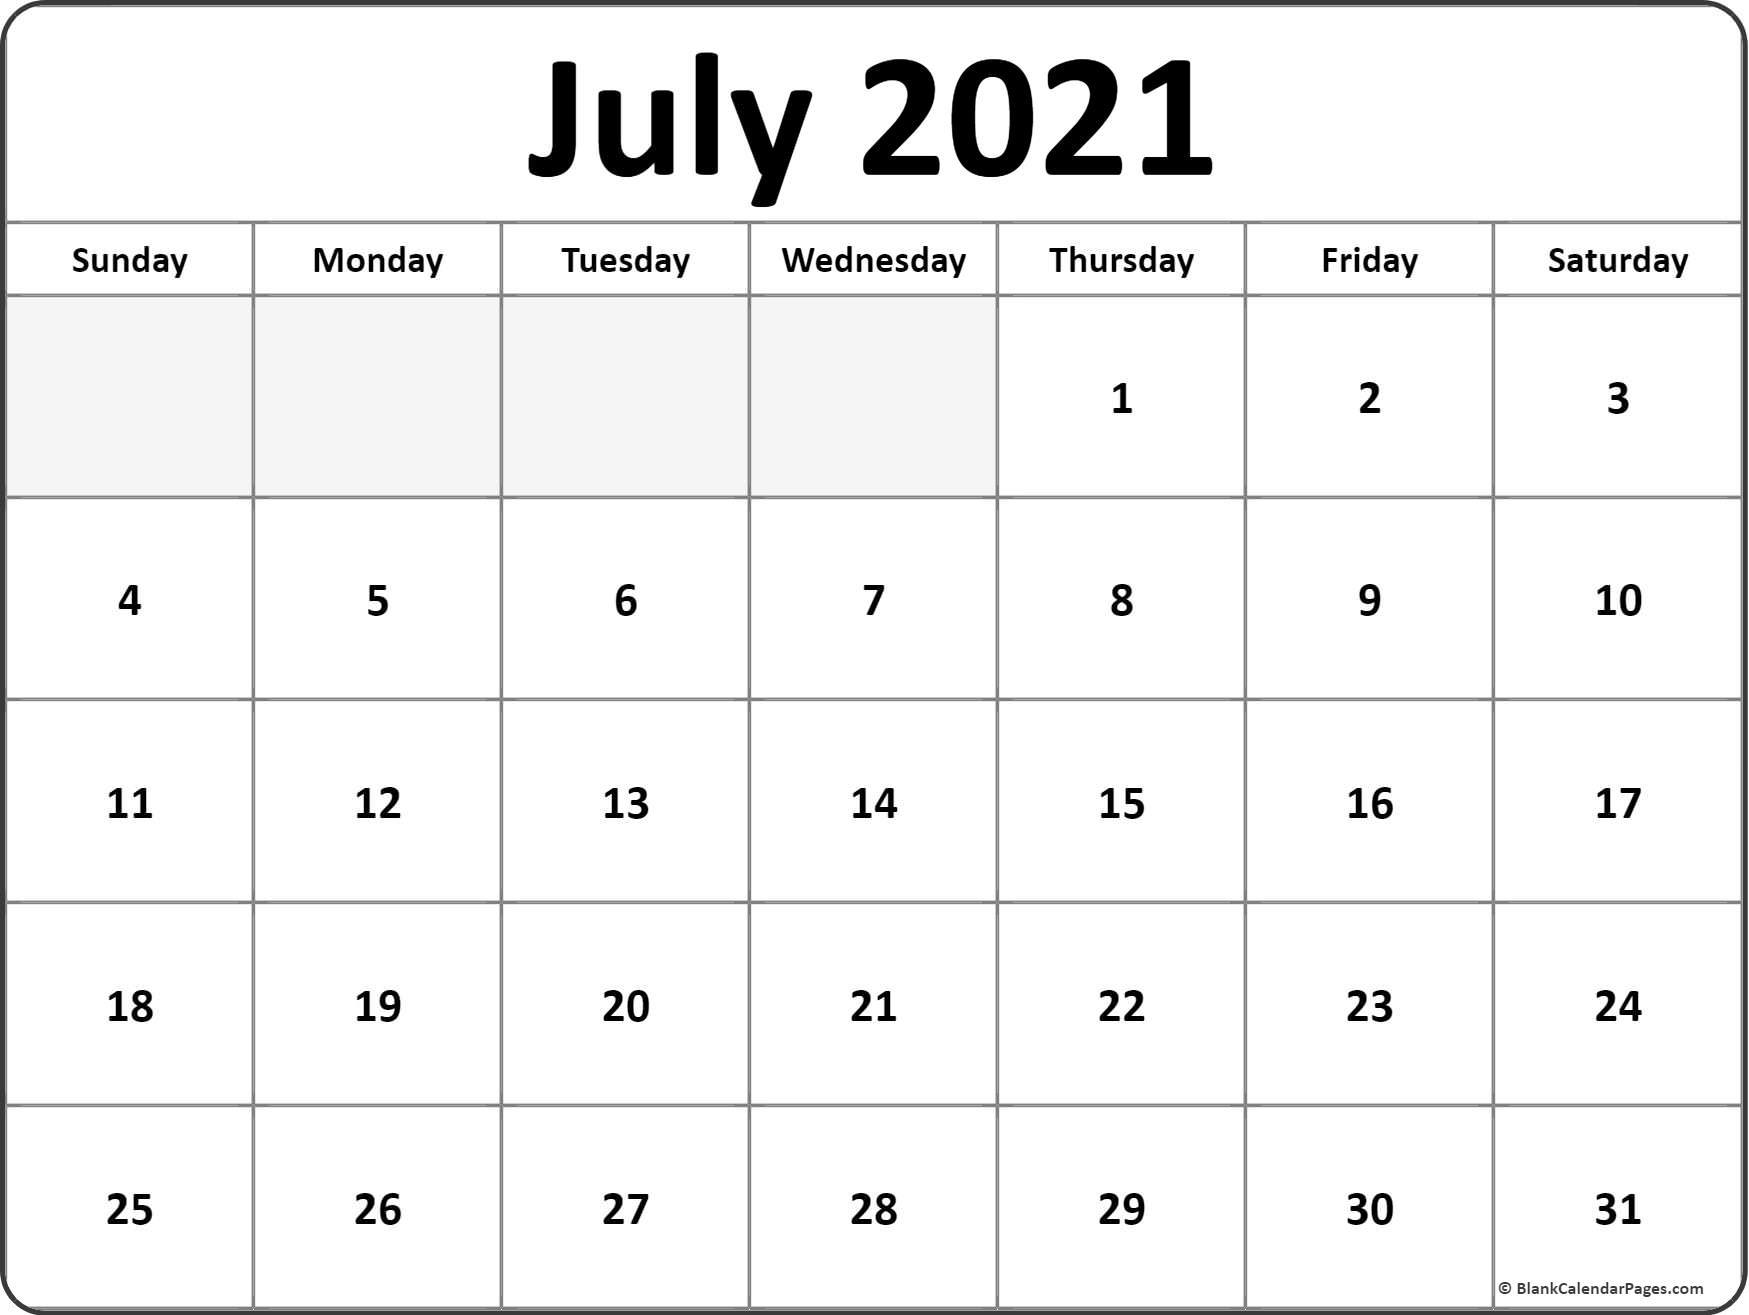 July 2021 Calendar | Free Printable Monthly Calendars